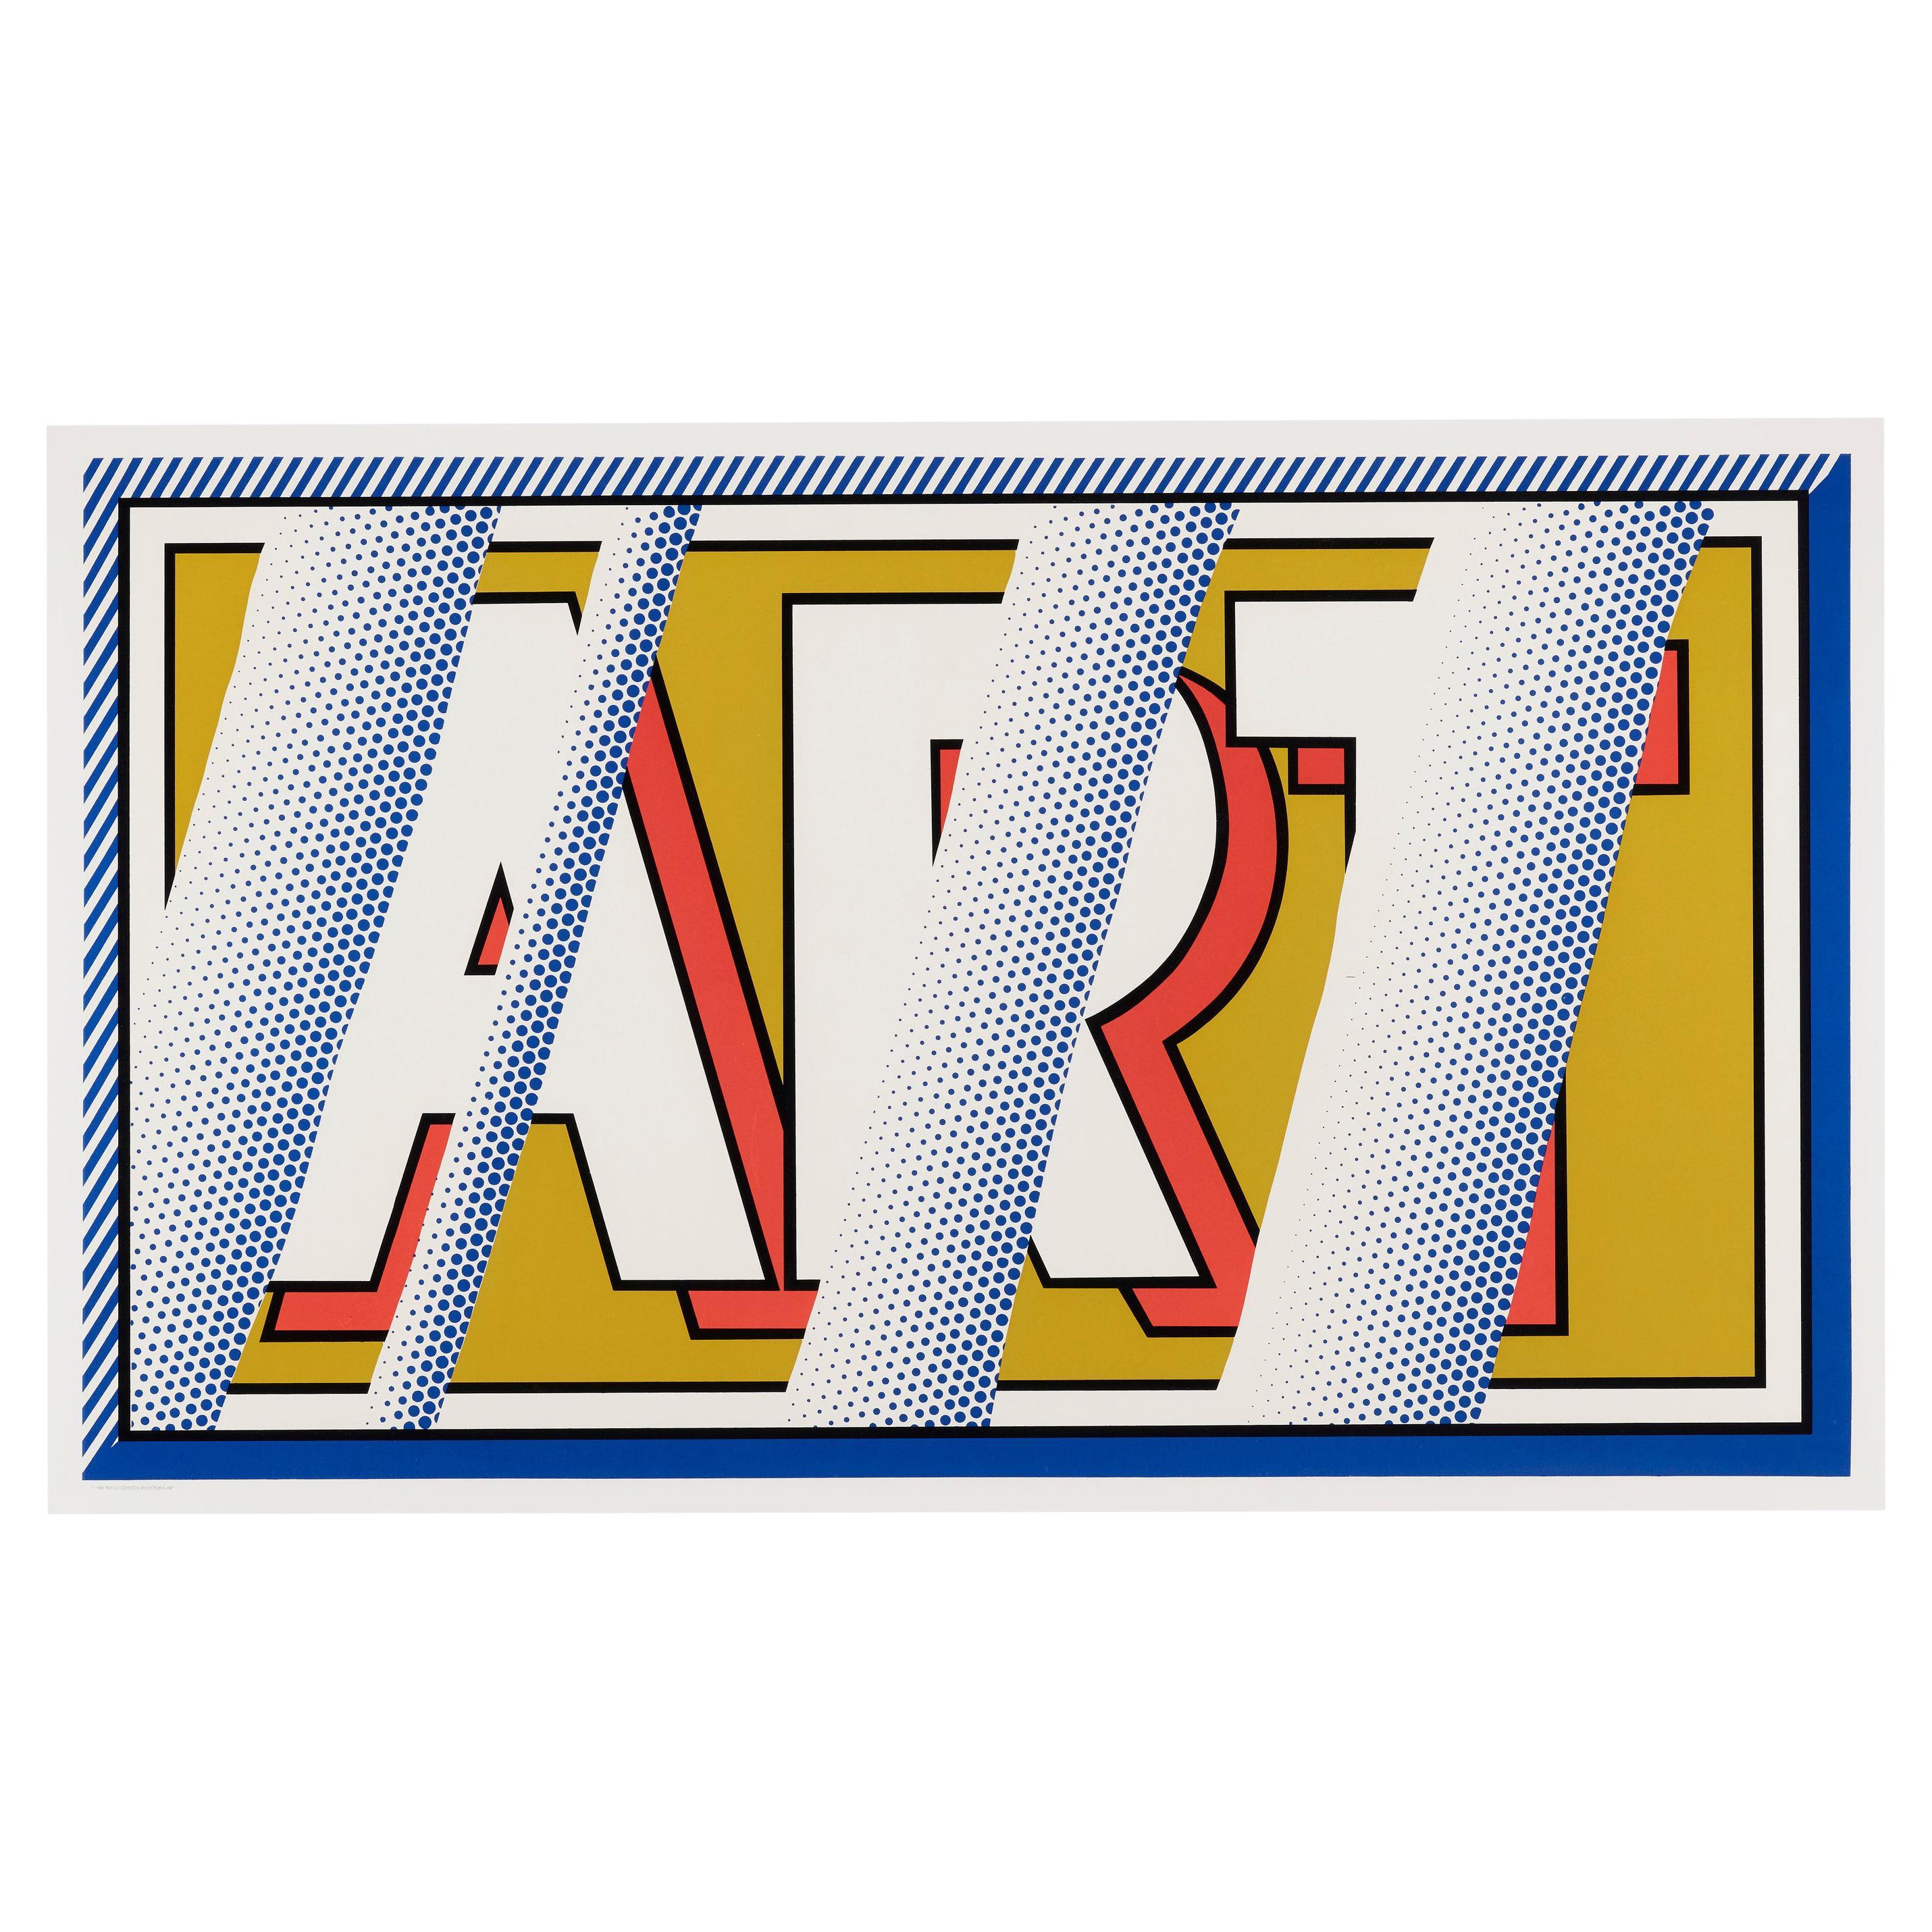 Roy Lichtenstein 1988 Handsigned Screenprint Art in Colors, Edition of 150